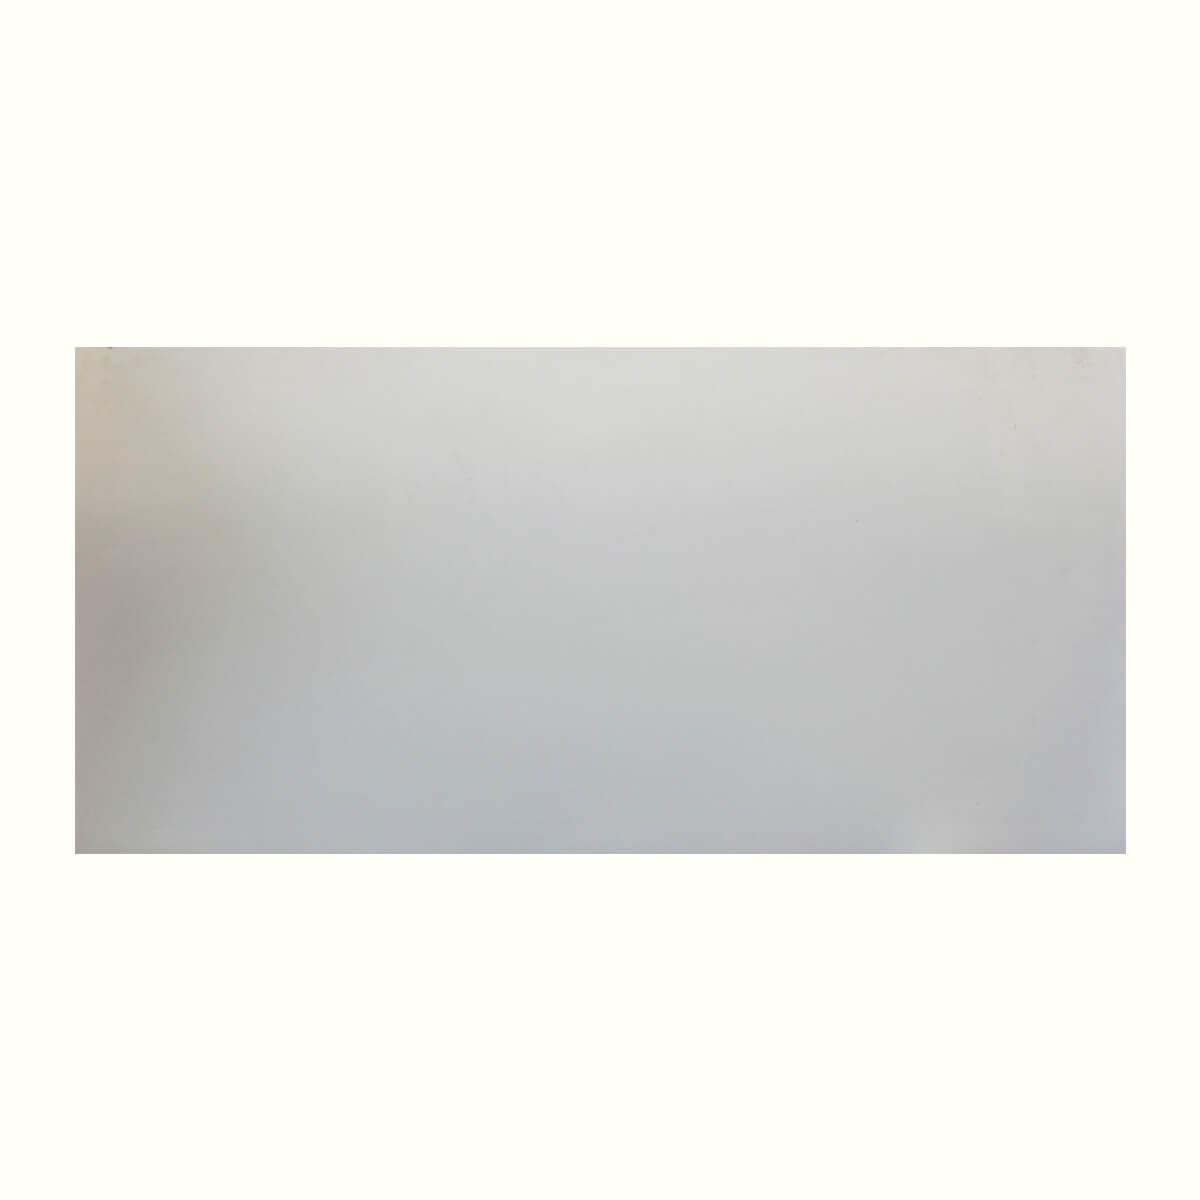 "Puck Board  - 4' x 8' -1/8"" sheet"